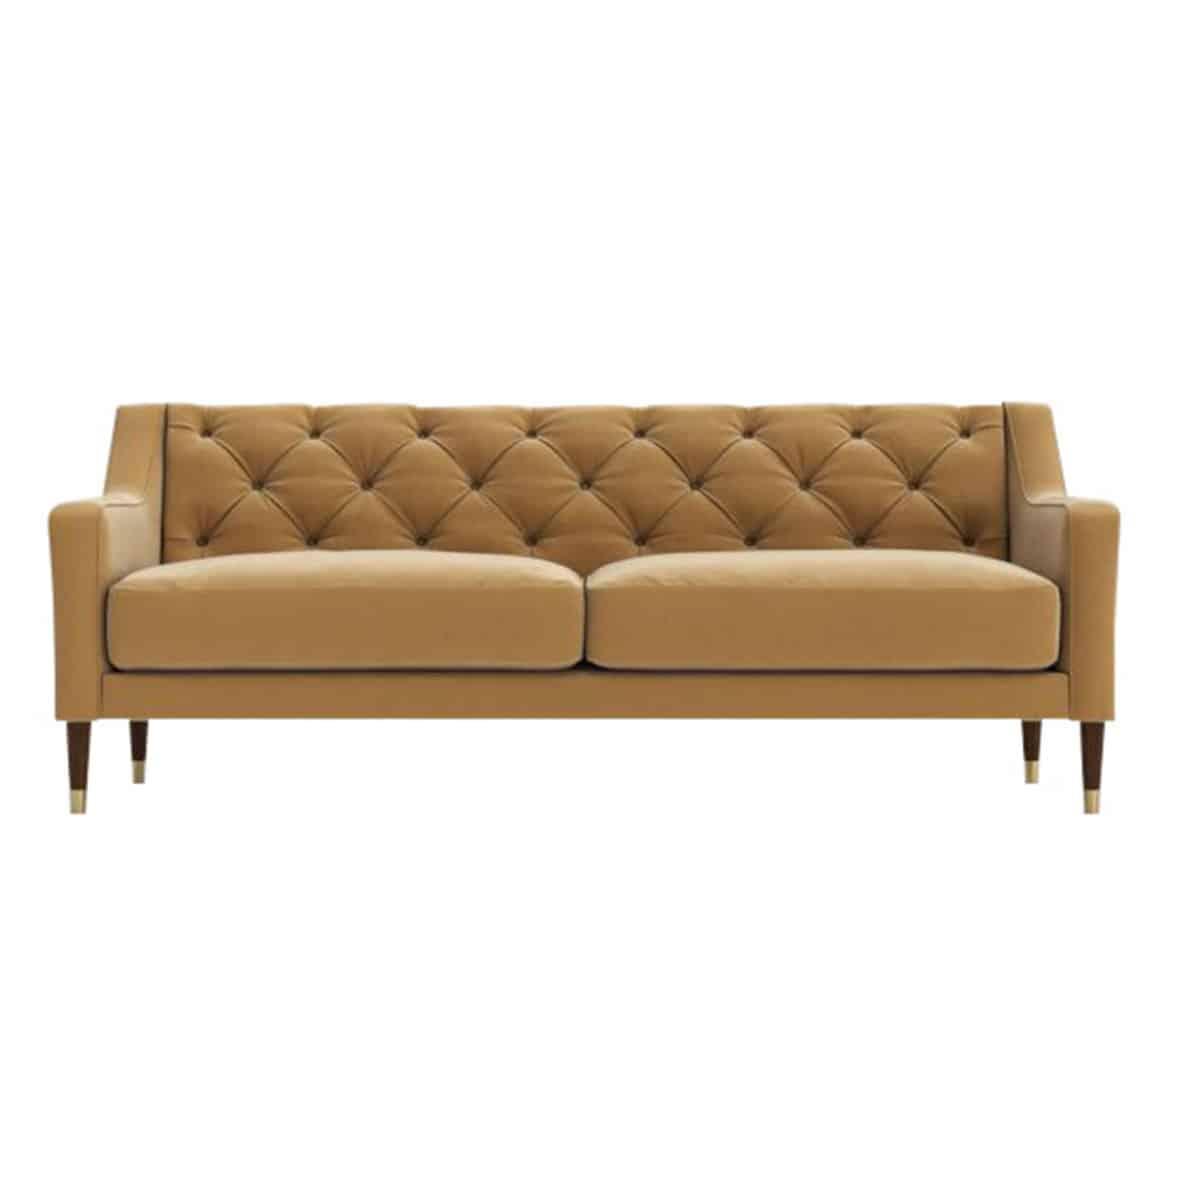 Ricardo Sofa with button back DeFrae Contract Furniture